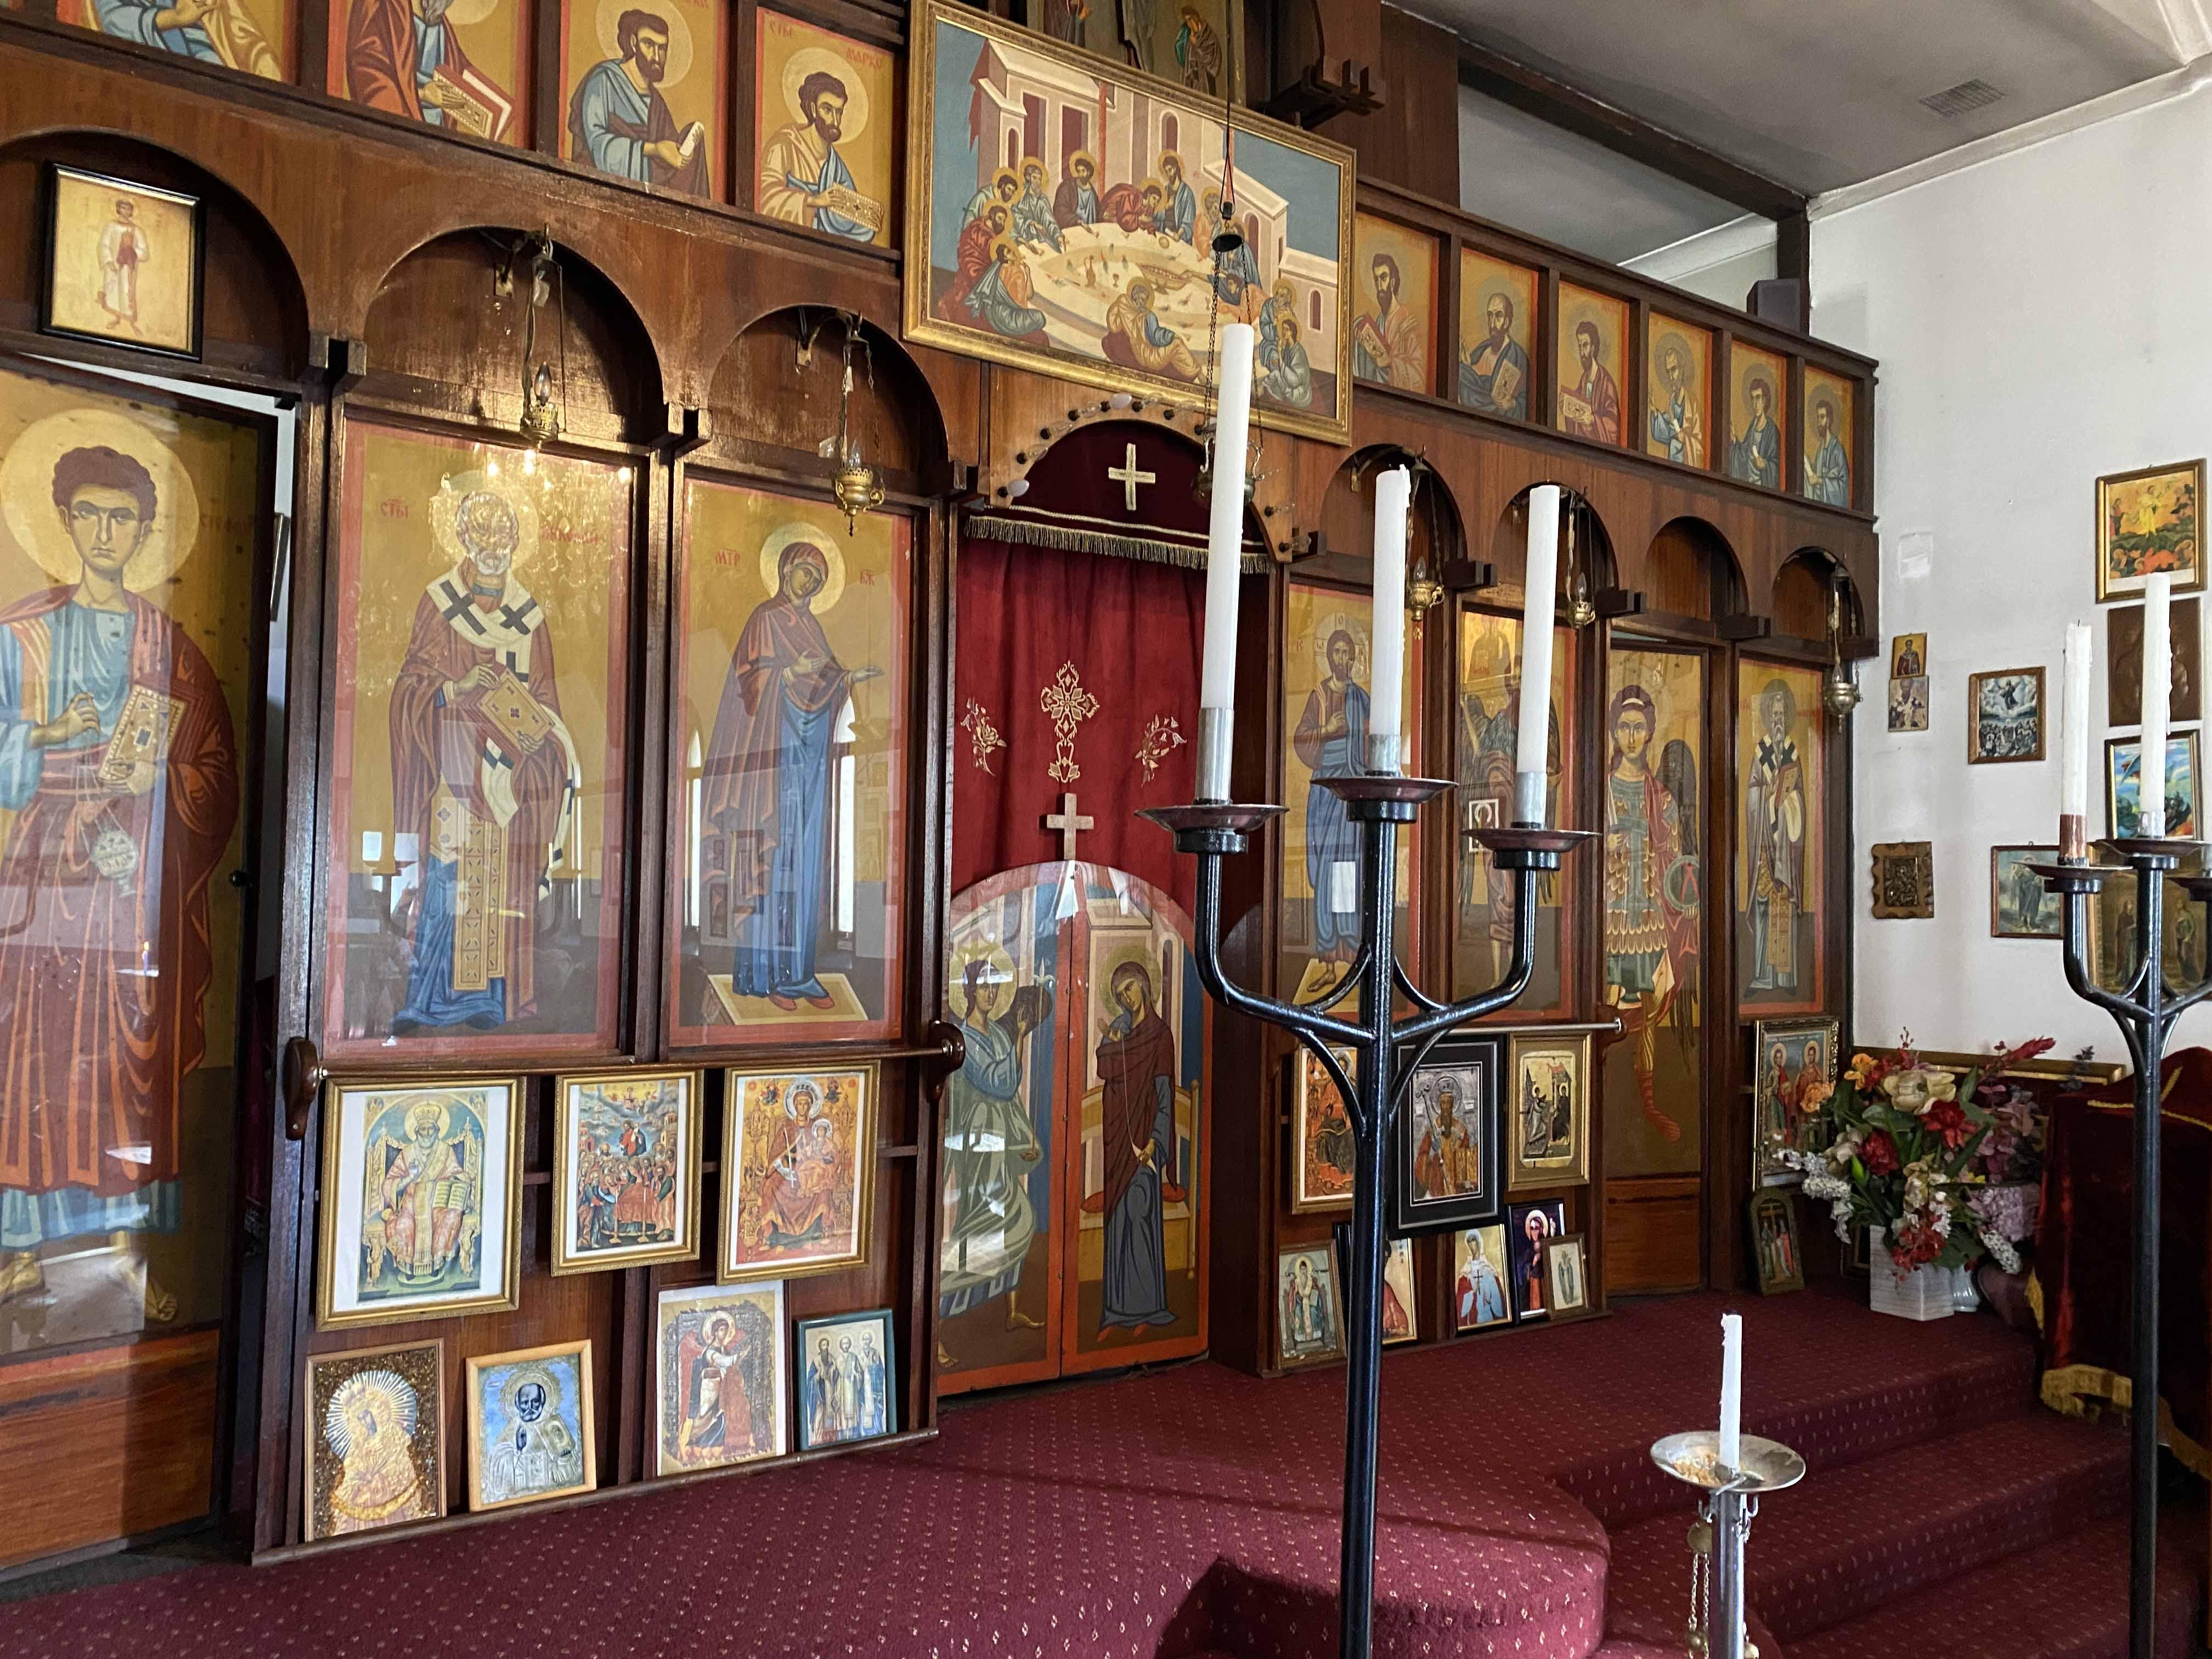 48. St Nikolas North Perth, 2020